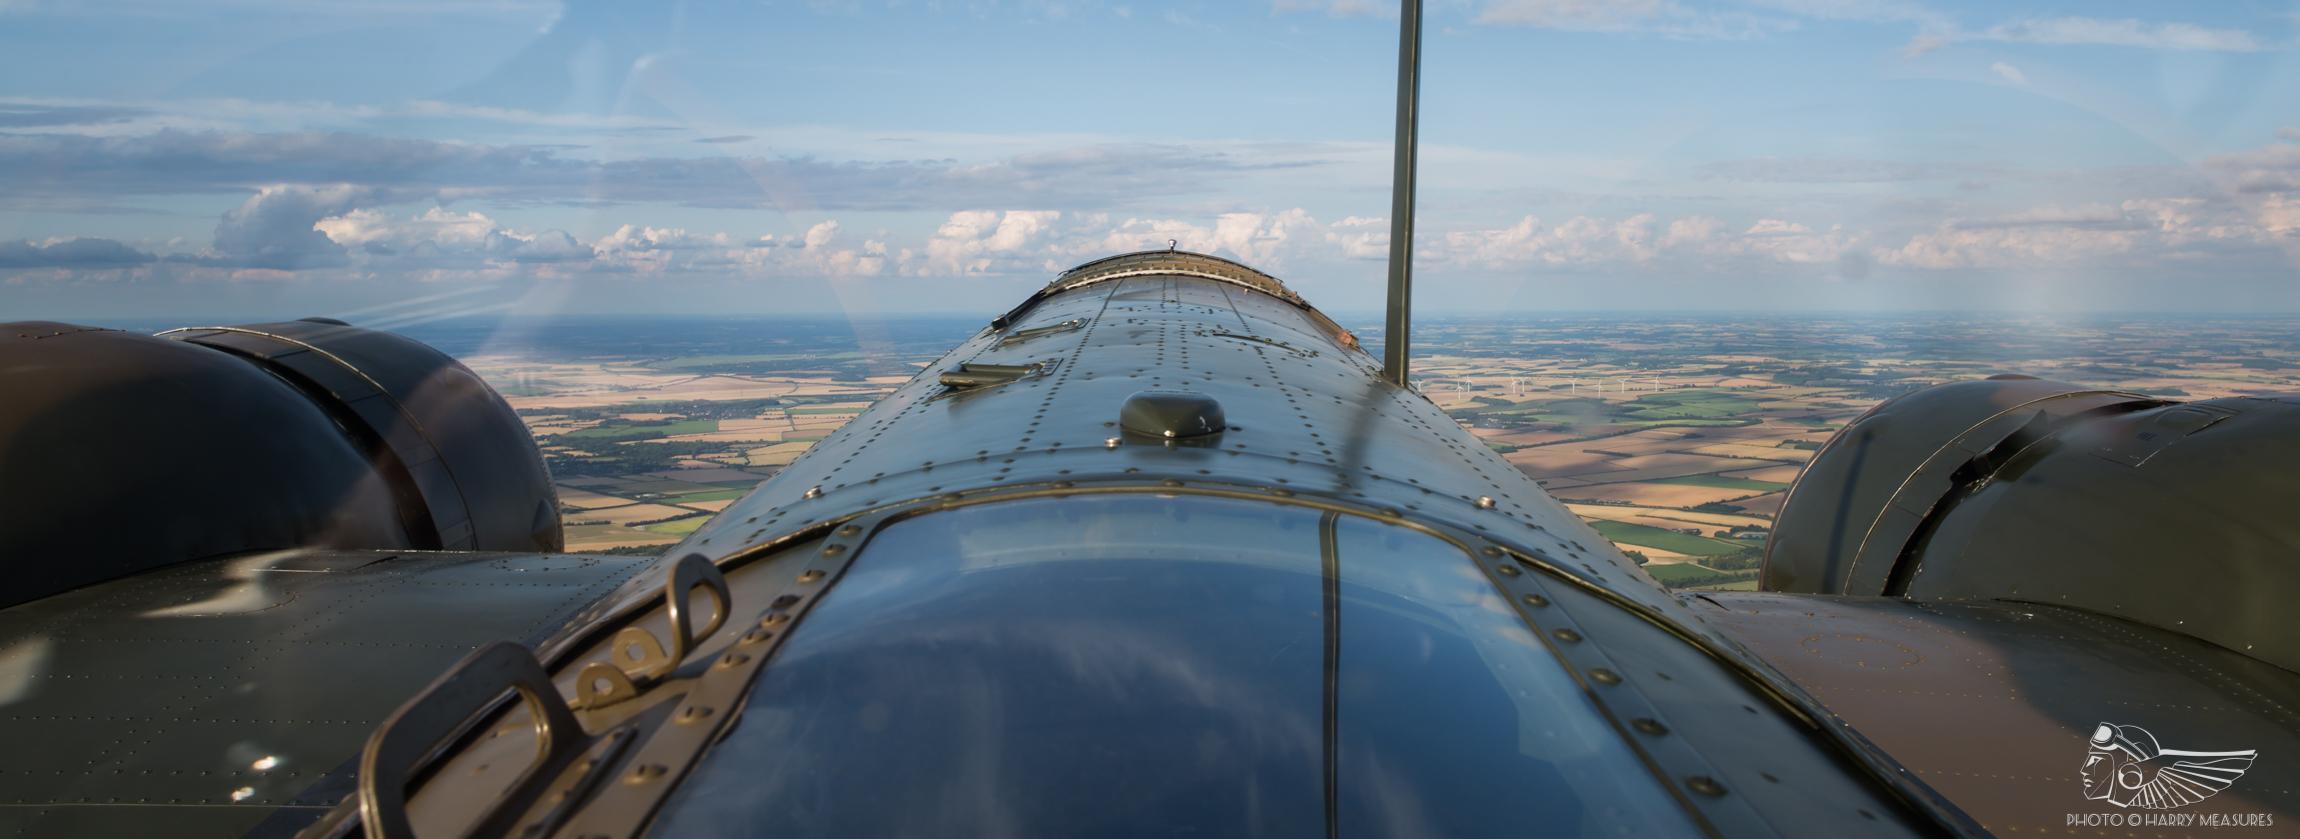 Taking flight in the Bristol Blenheim